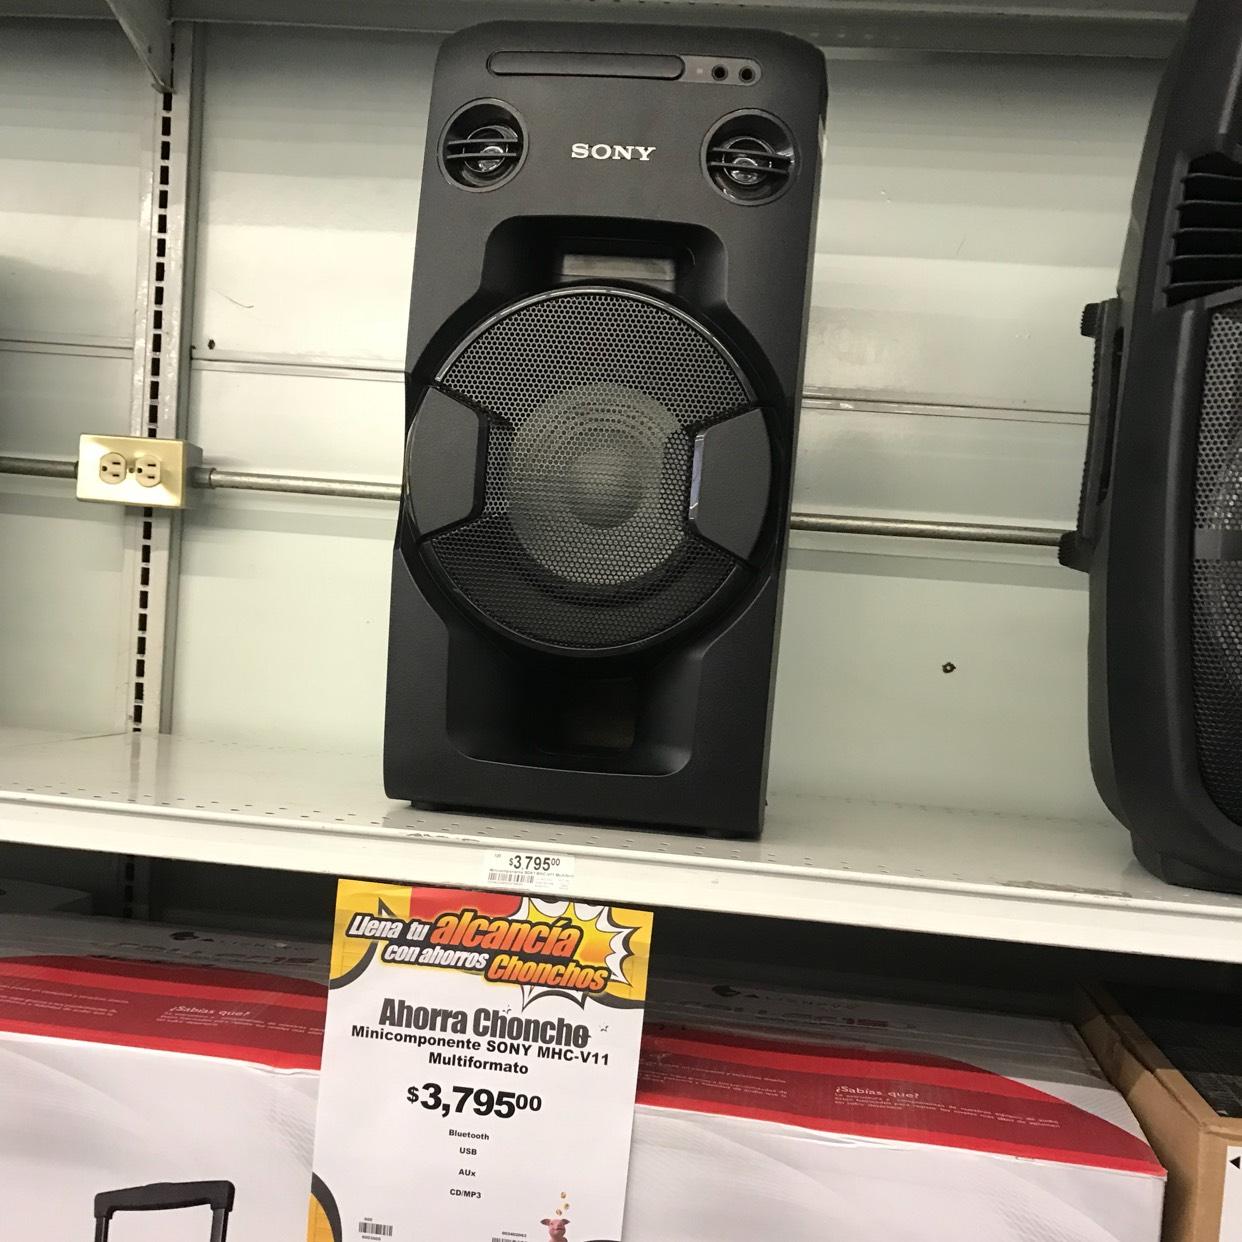 Chedraui: Minicomponente Sony a $3,795